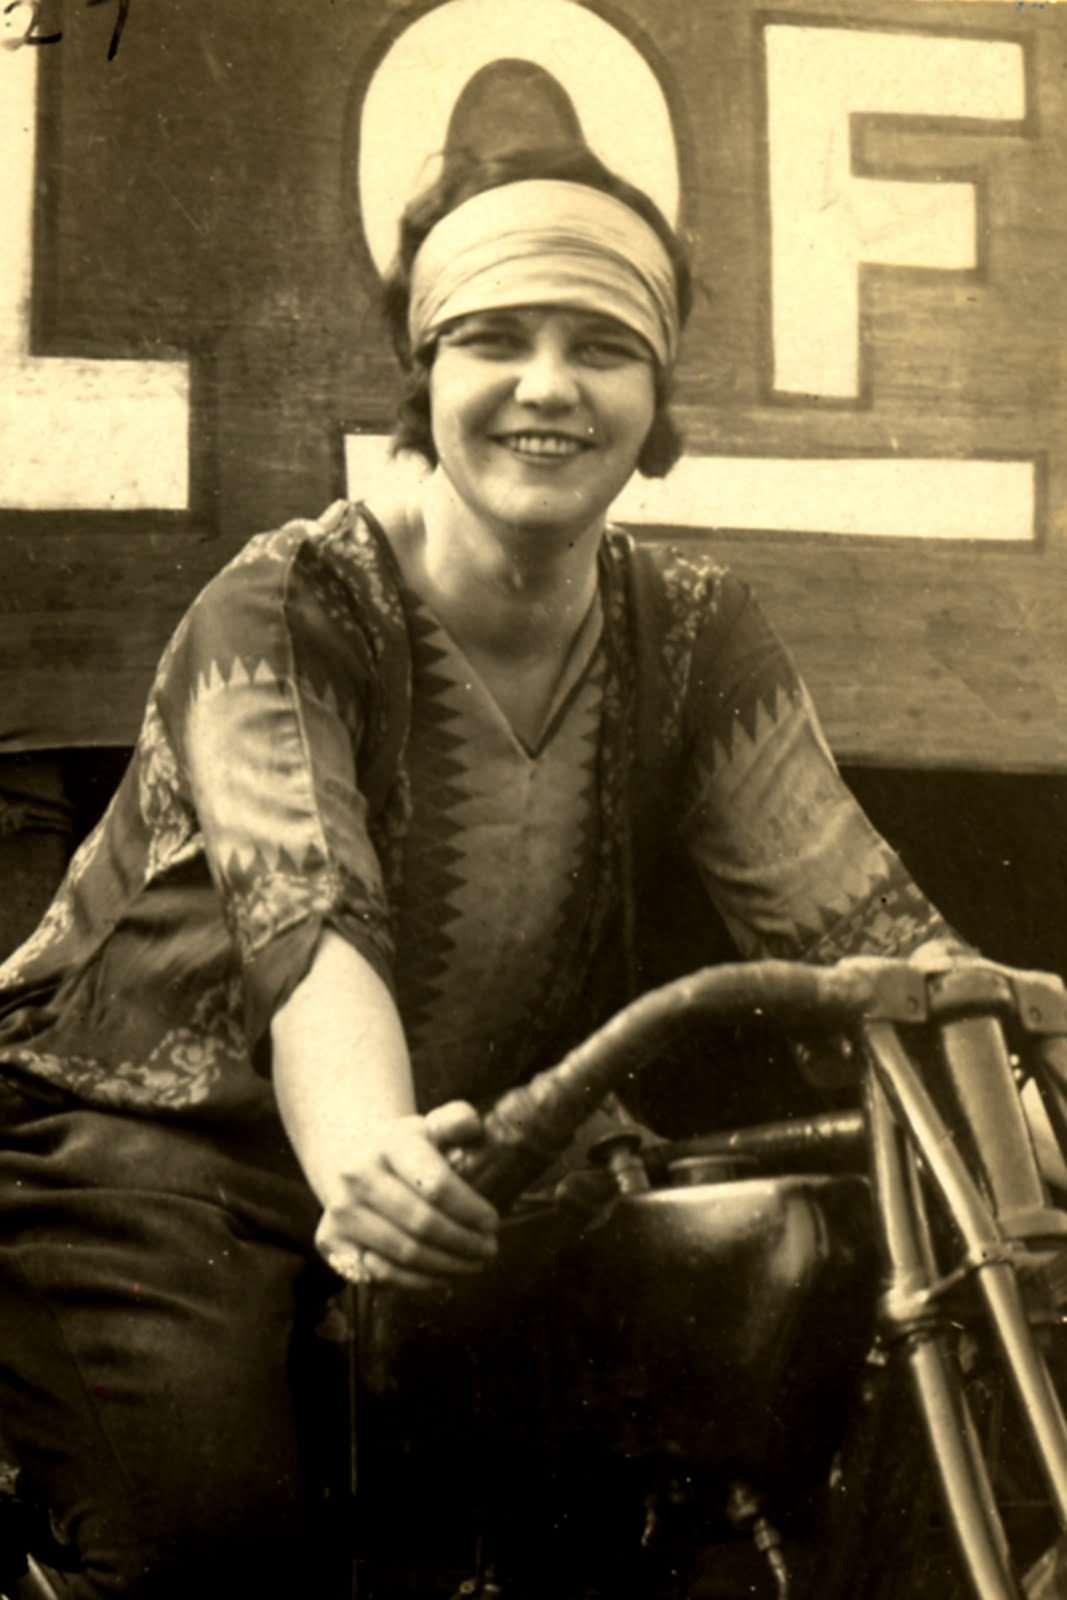 Hazel_Wall_of_Death_1927